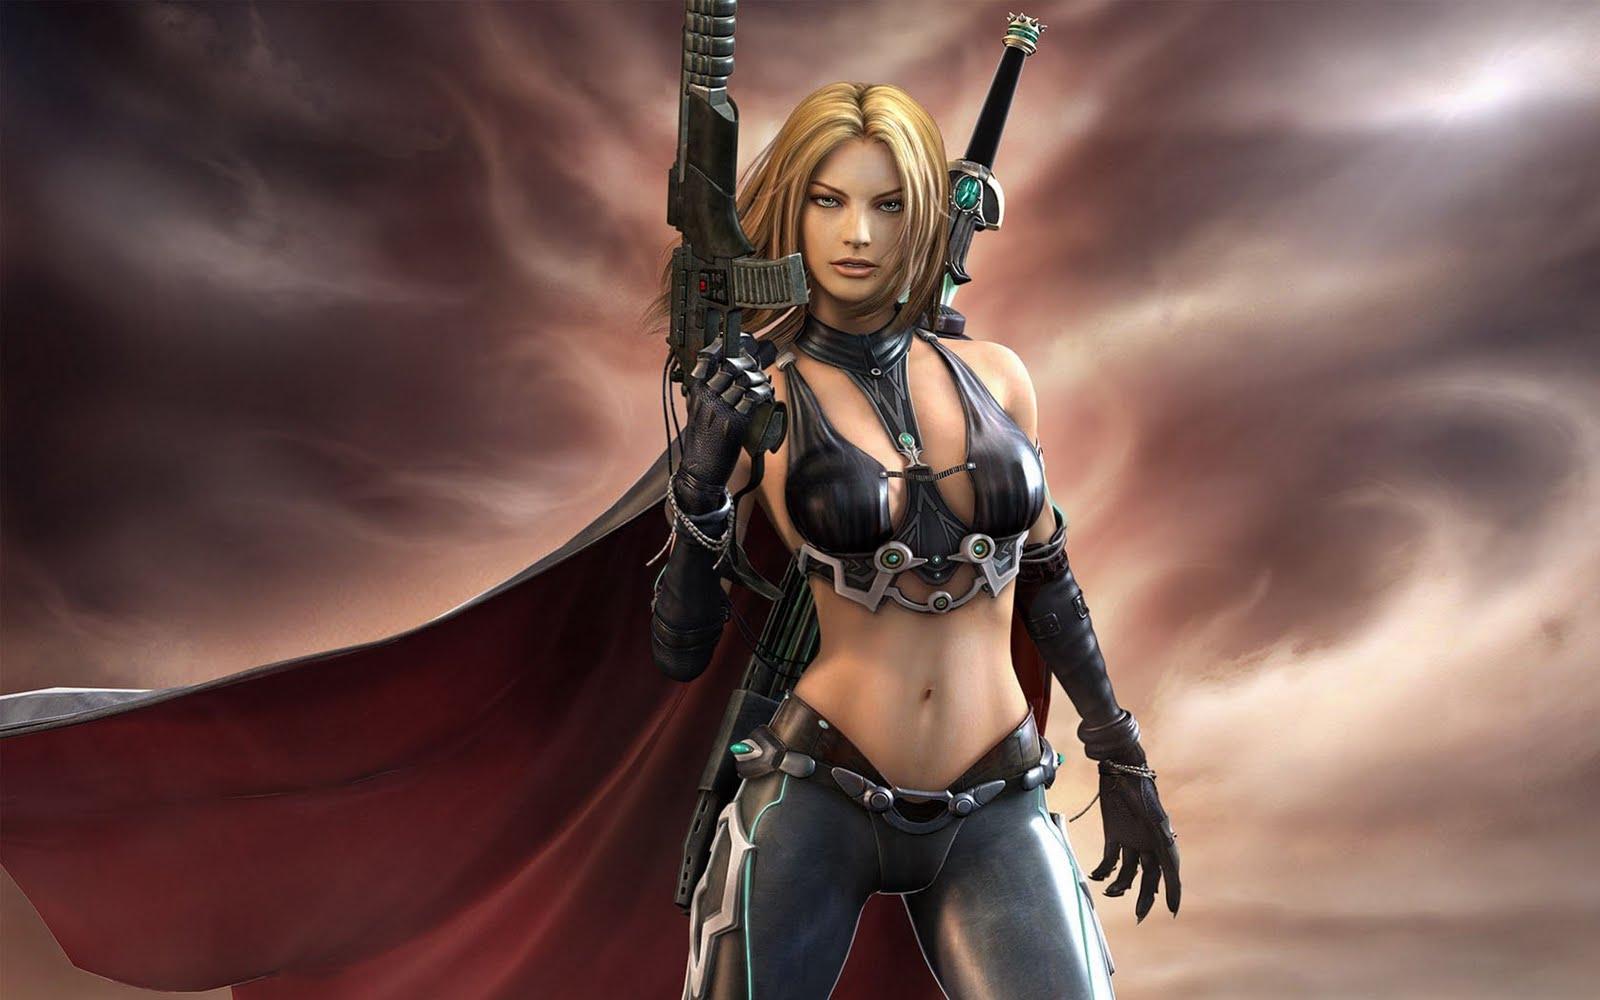 http://3.bp.blogspot.com/_cZuaghvCasw/THKUHynzgcI/AAAAAAAAKg0/-wywQzbqNzk/s1600/3D-Sexy-Girl.jpg